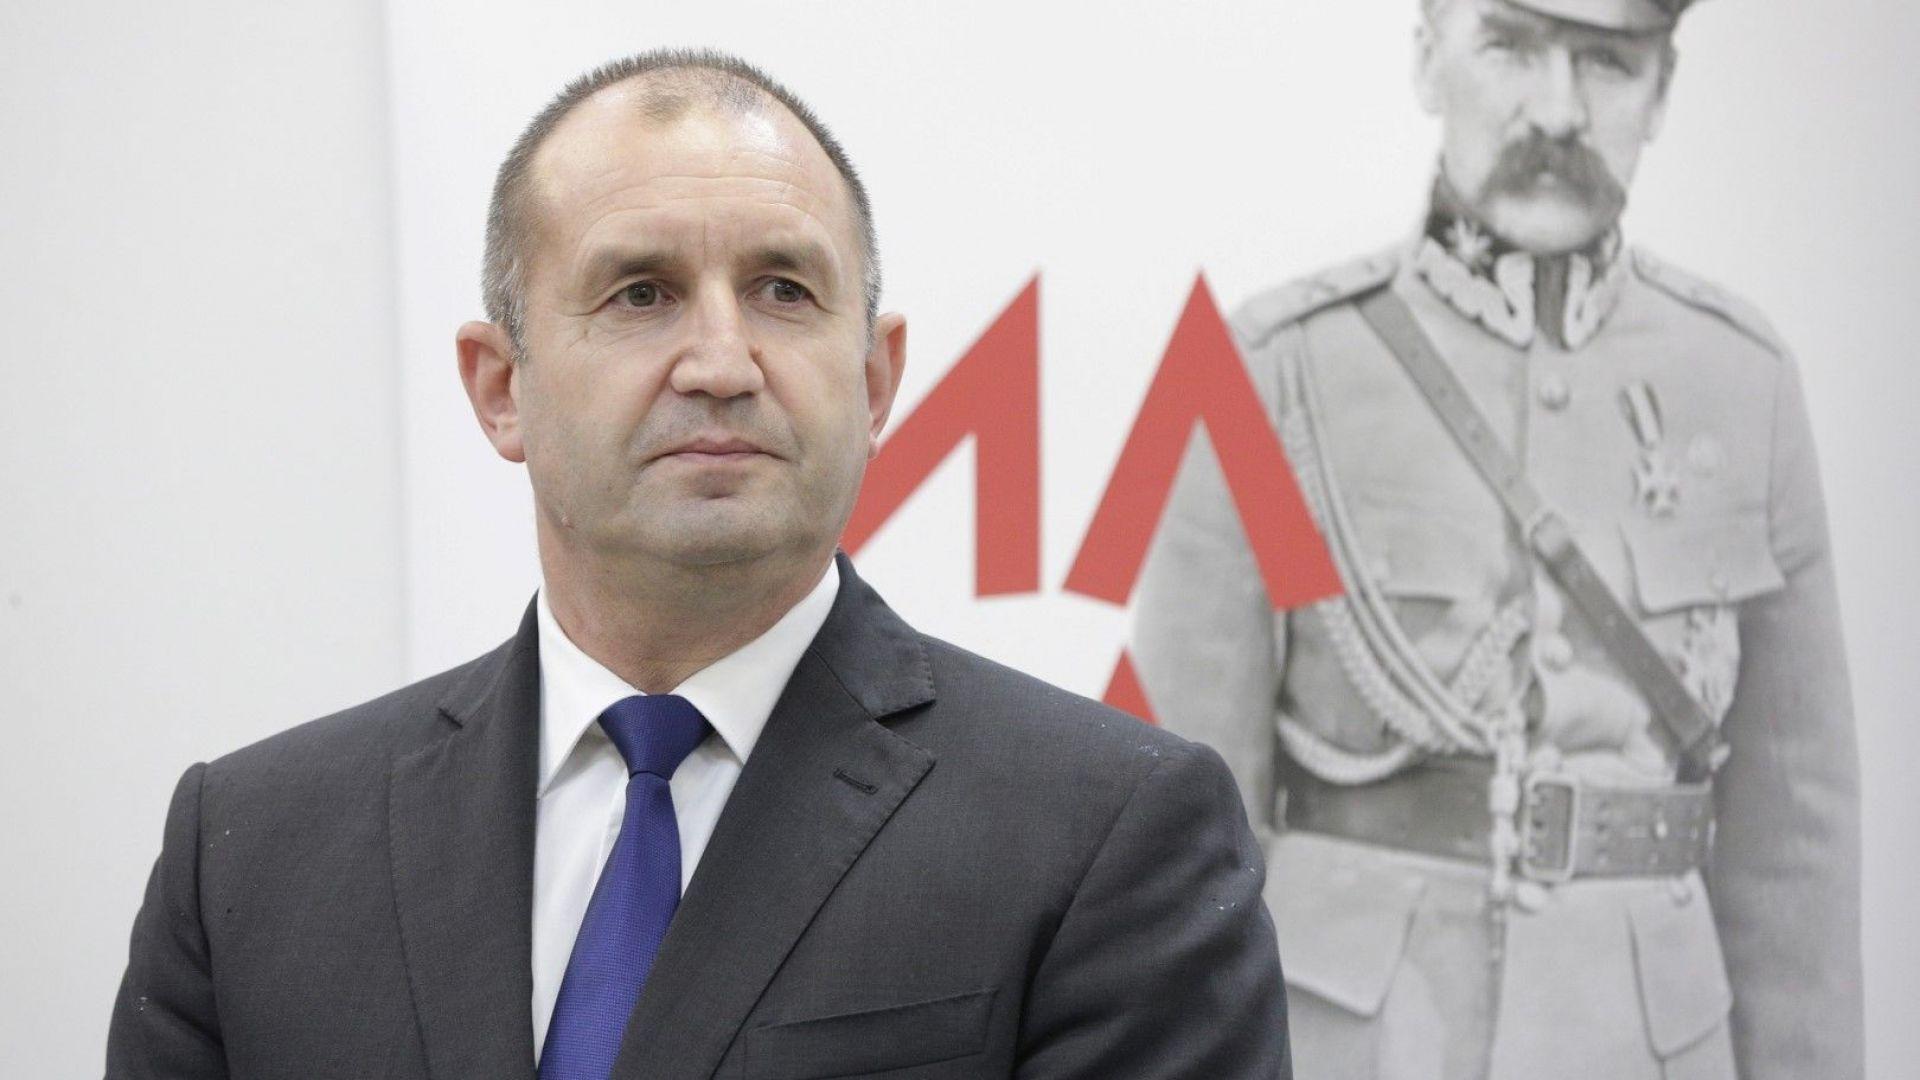 Радев: България не може да допусне загуба на конкурентоспособност в енергетиката